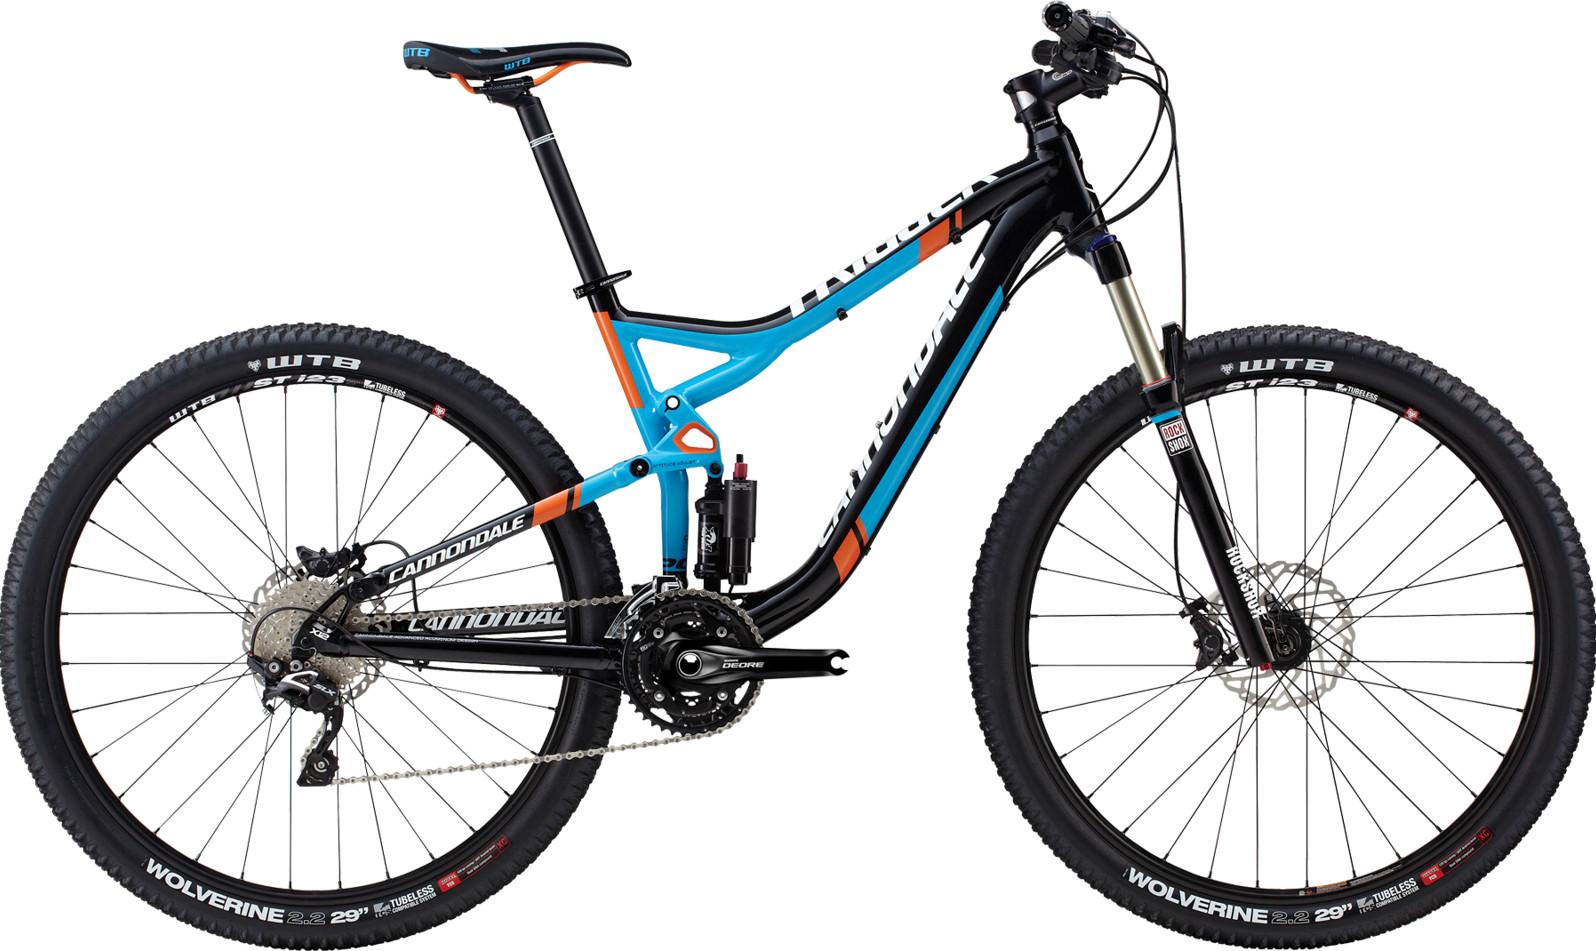 bike - 2014 Cannondale Trigger 29 4